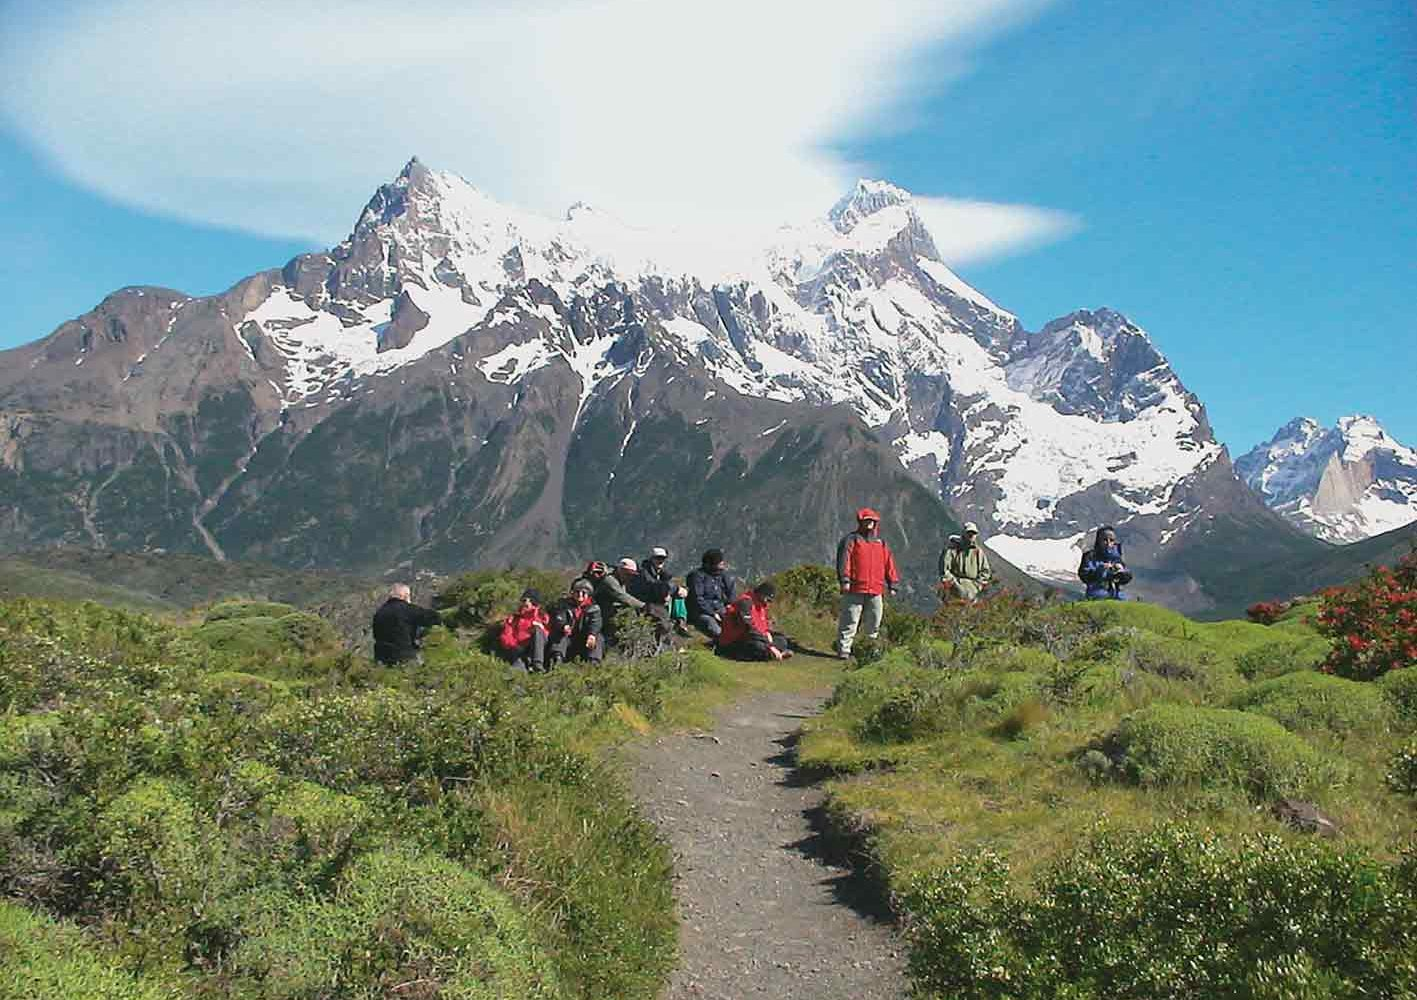 Patagonien Reise, Wandern im Torres del Paine-Nationalpark, Chile